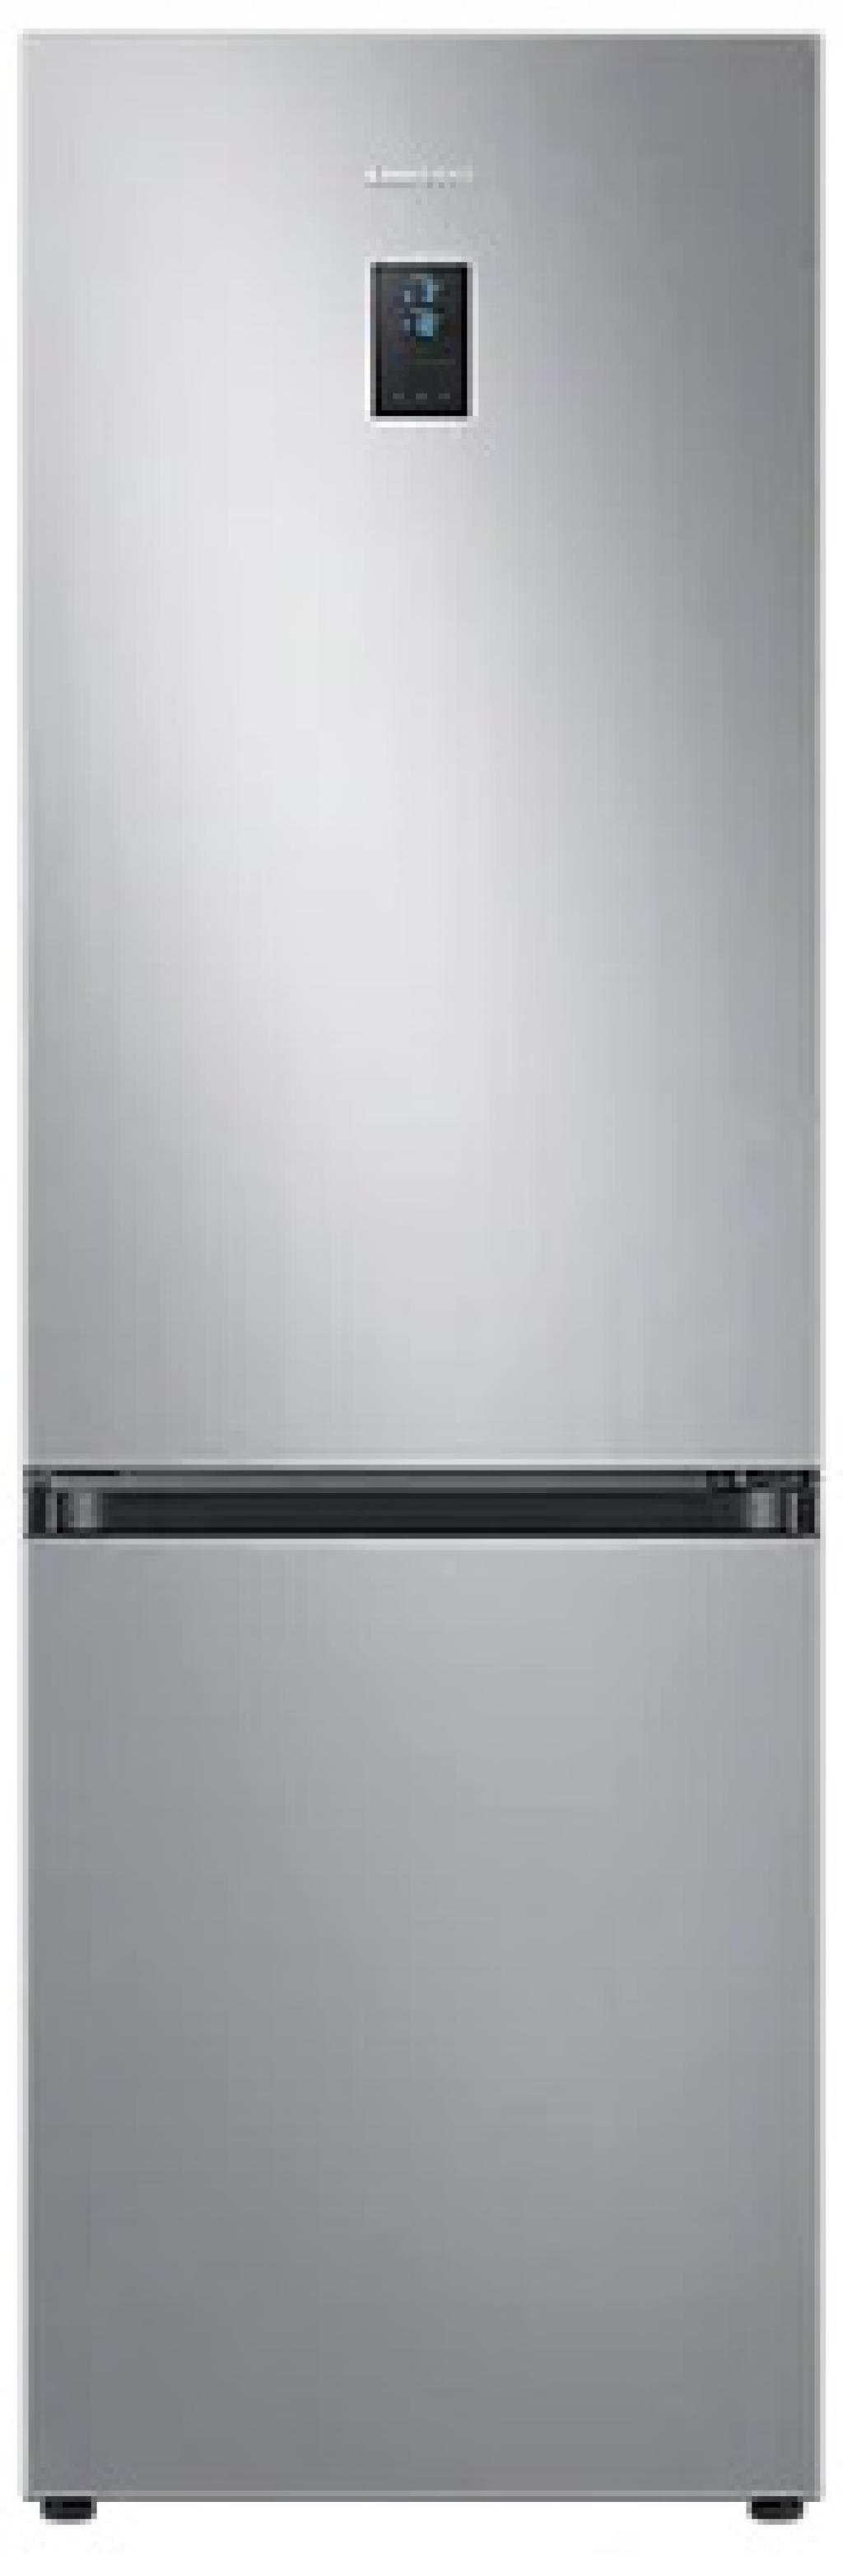 Хладилник с фризер Samsung RB34T670ESA/EF